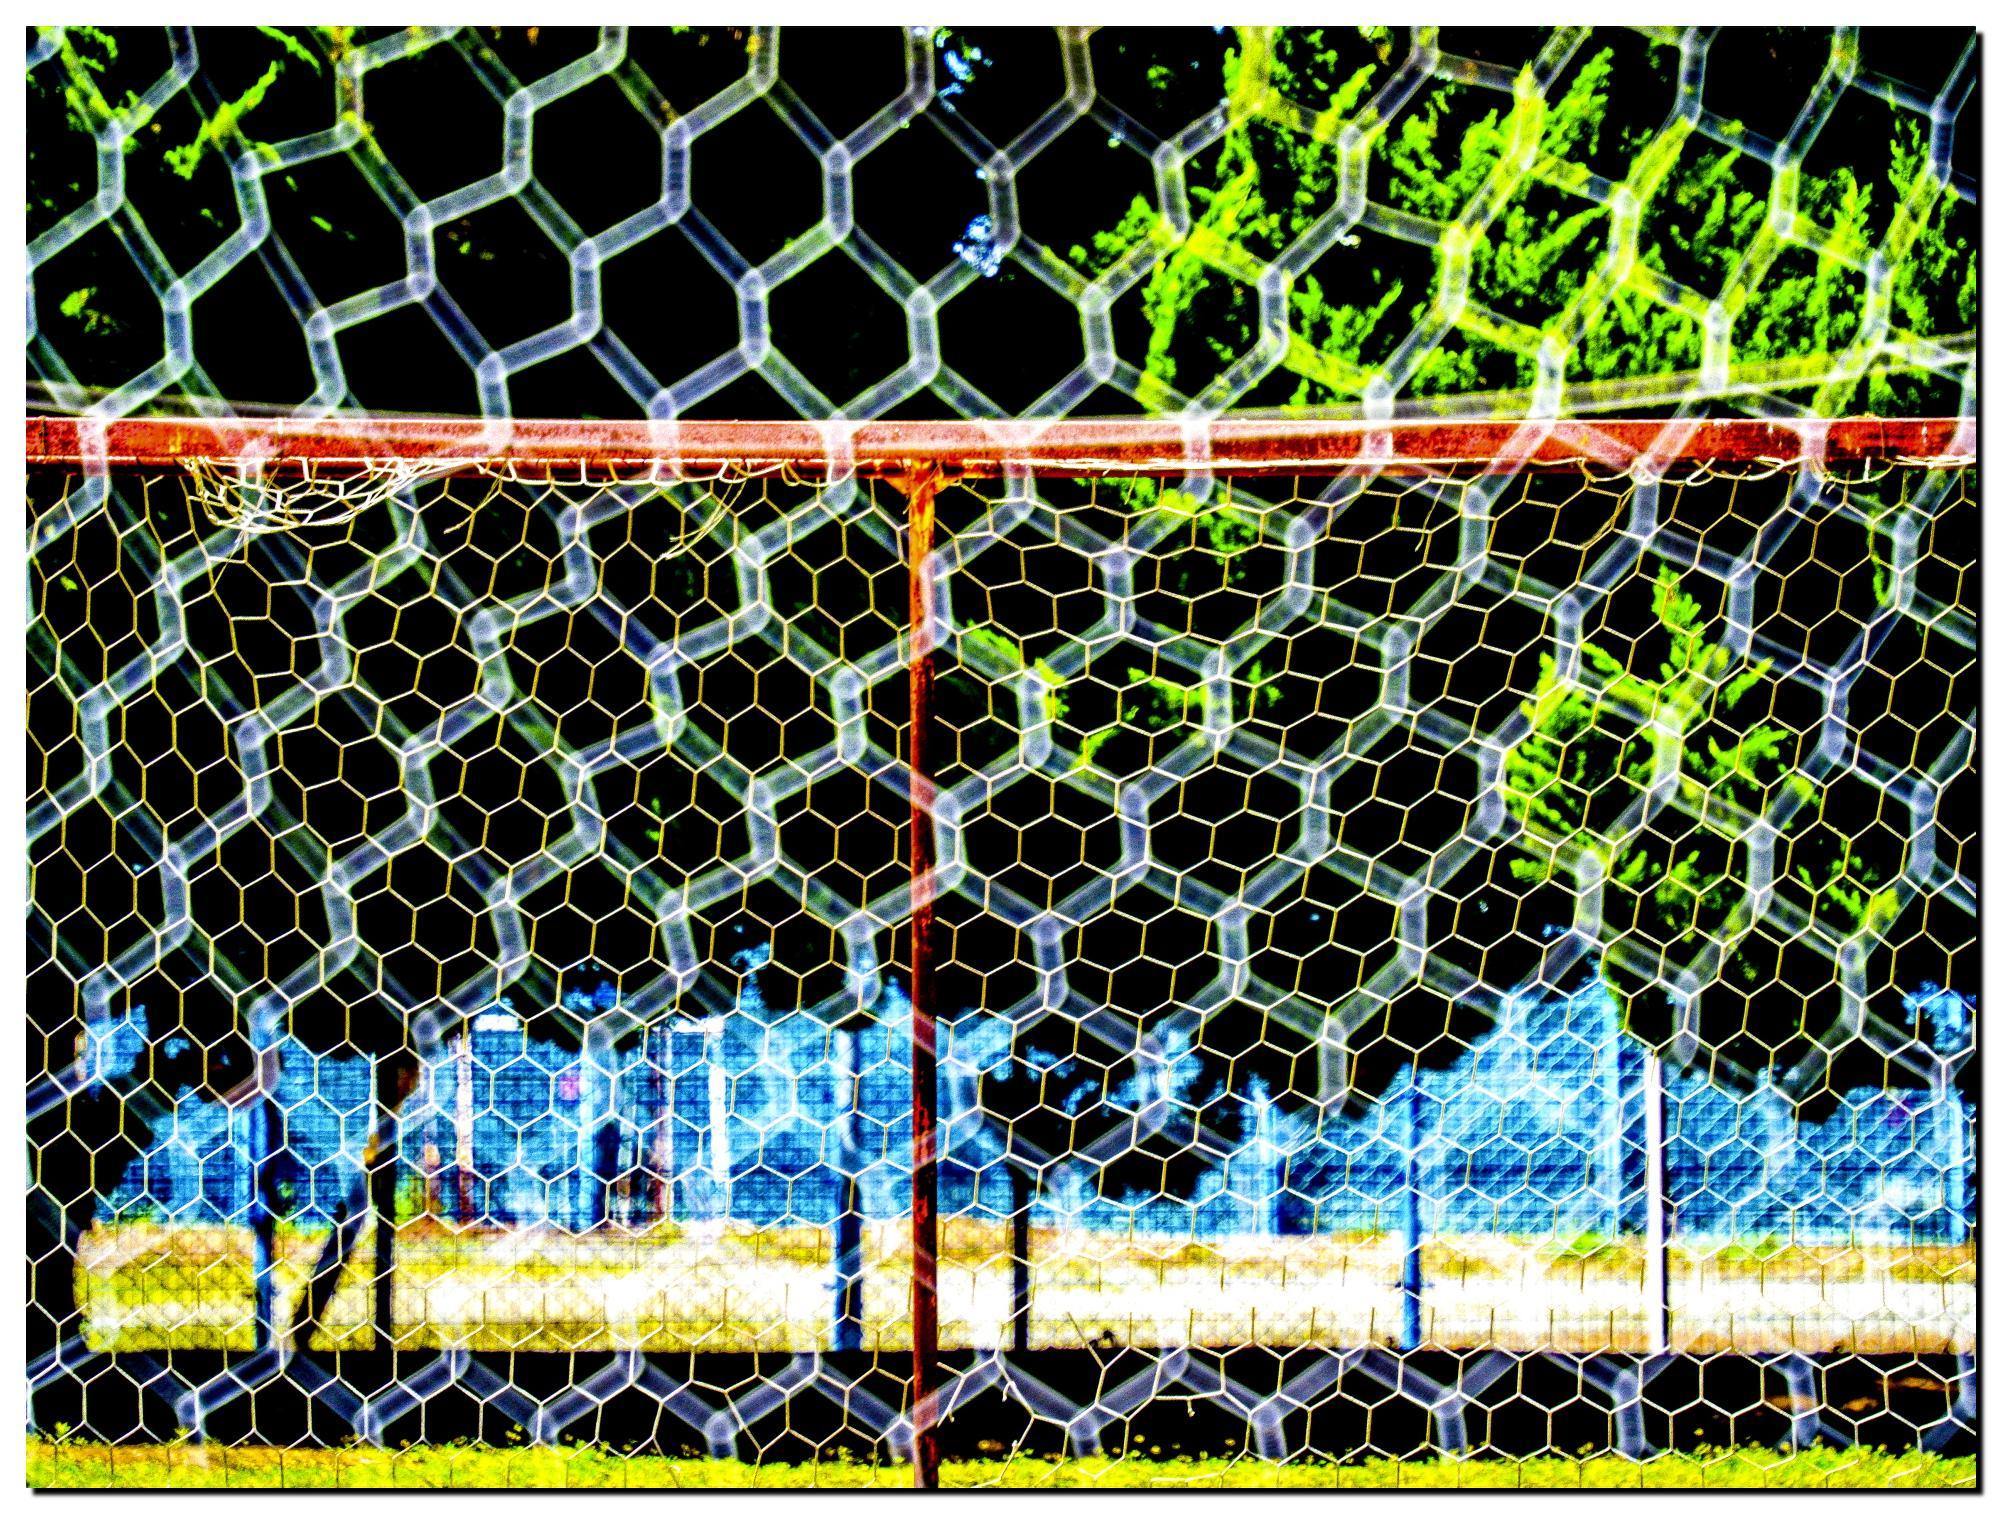 01LR6-P6167646-Edit-1.jpg